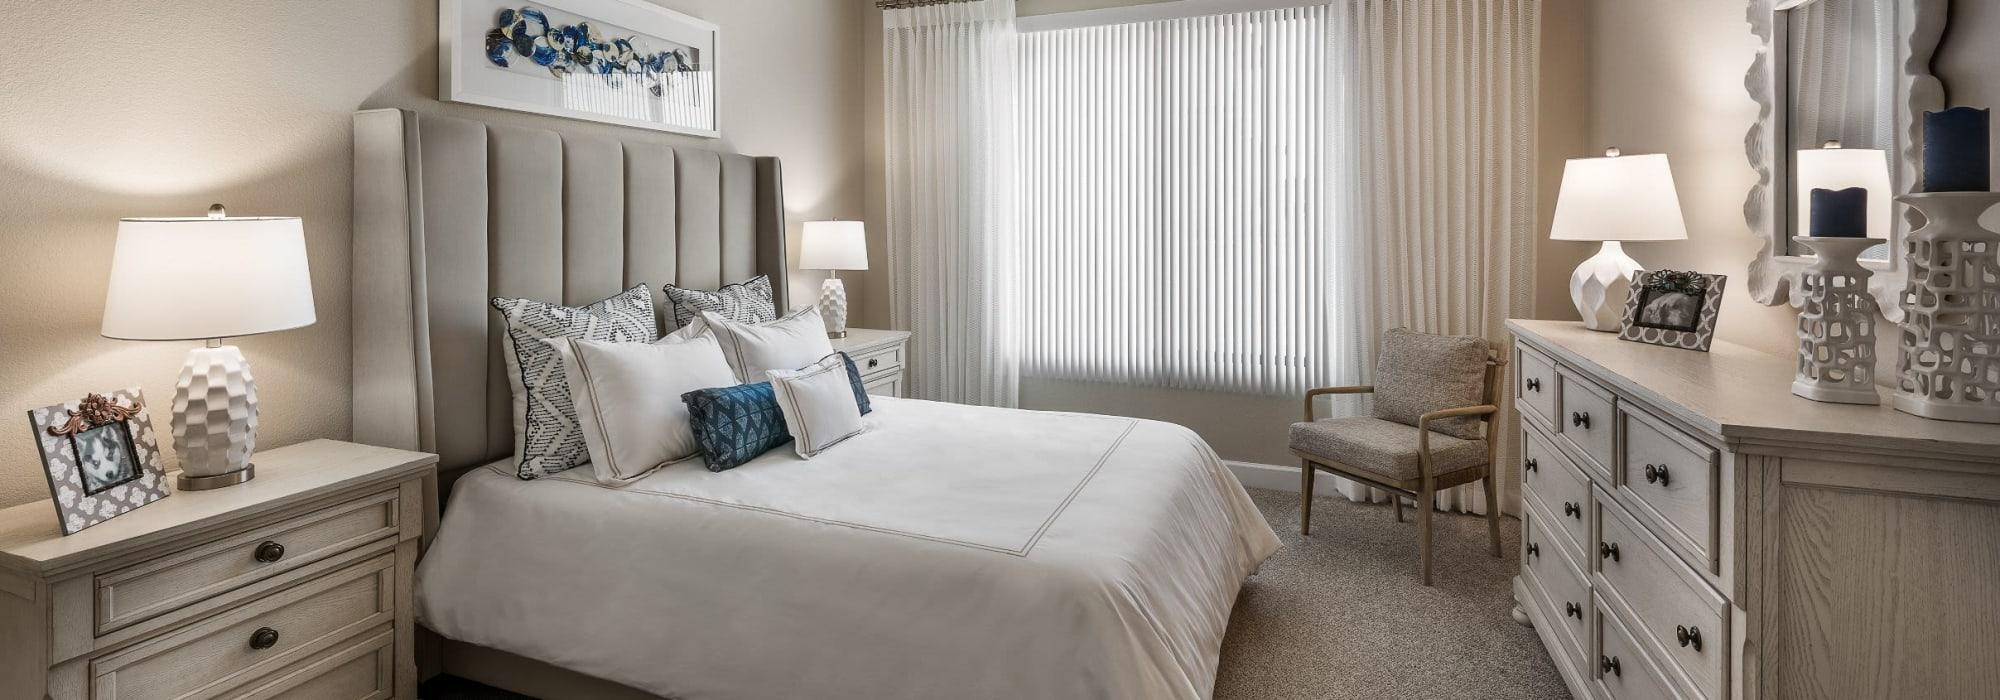 Spacious bedroom with carpet floors San Artes in Scottsdale, Arizona